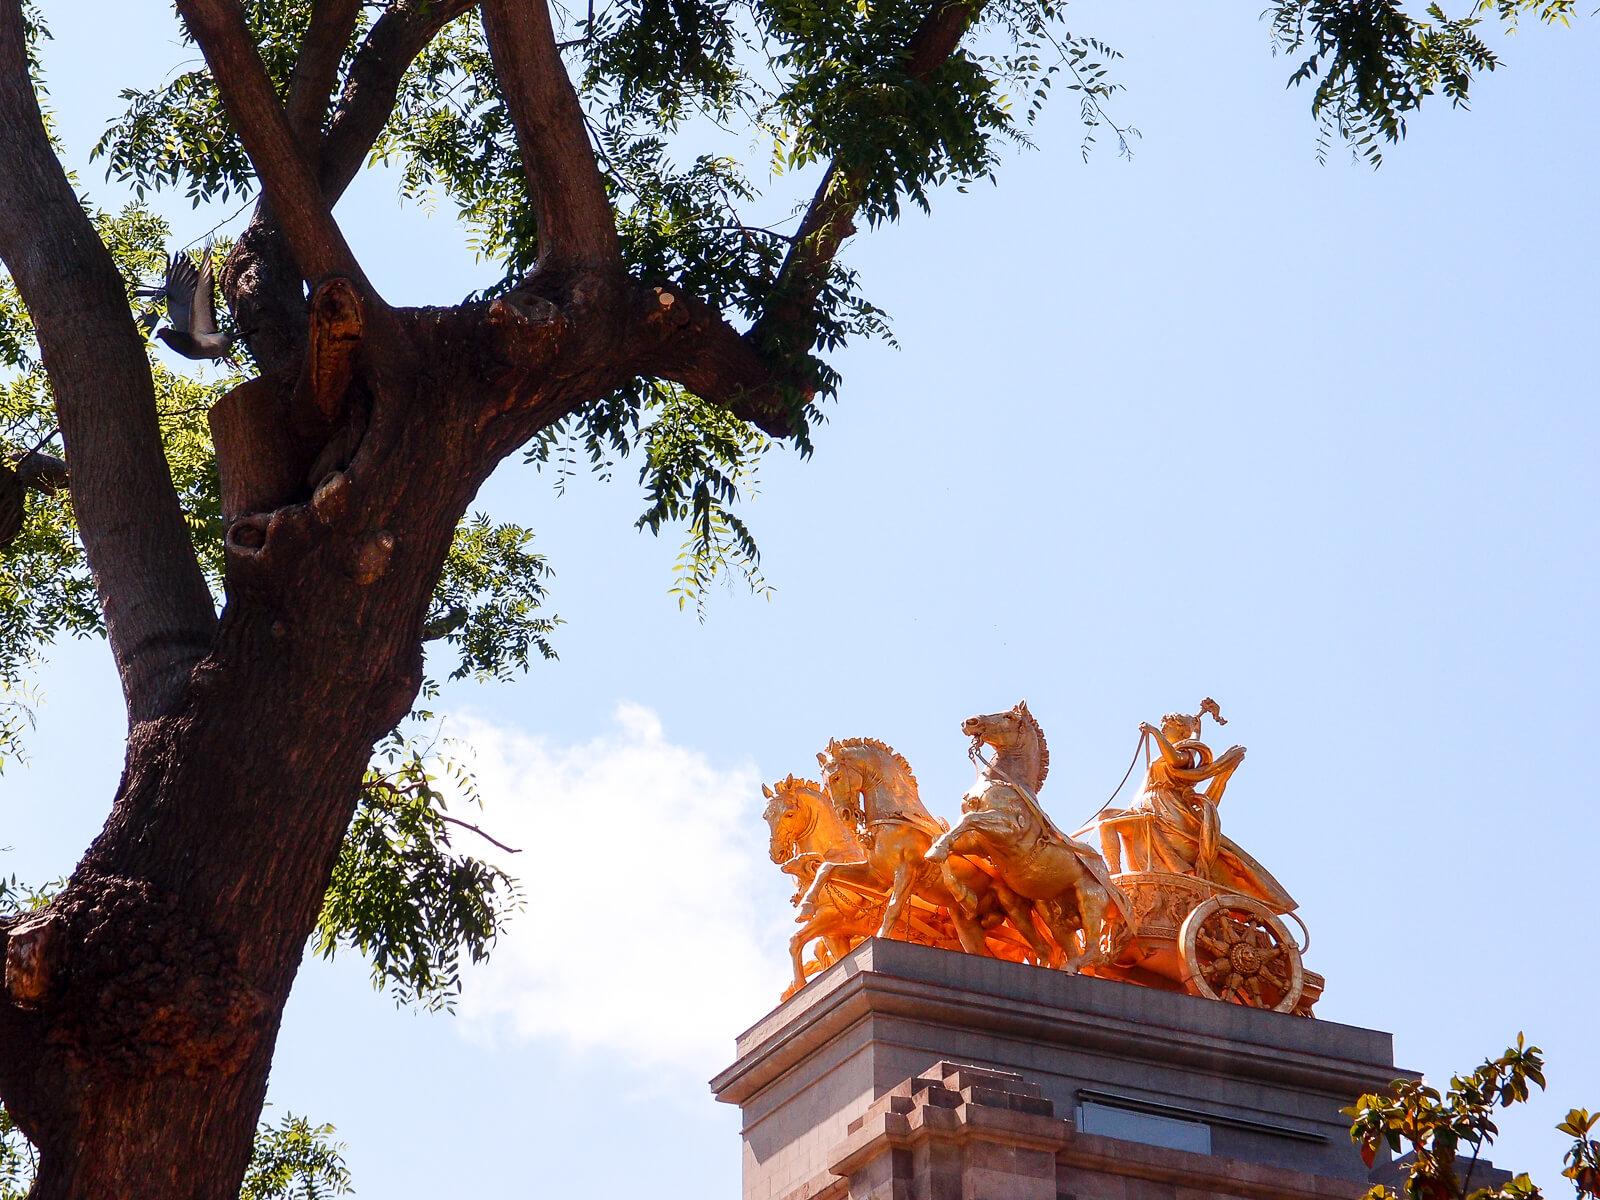 Barcelona Street Photography, cascada monumental fountain, golden chariot